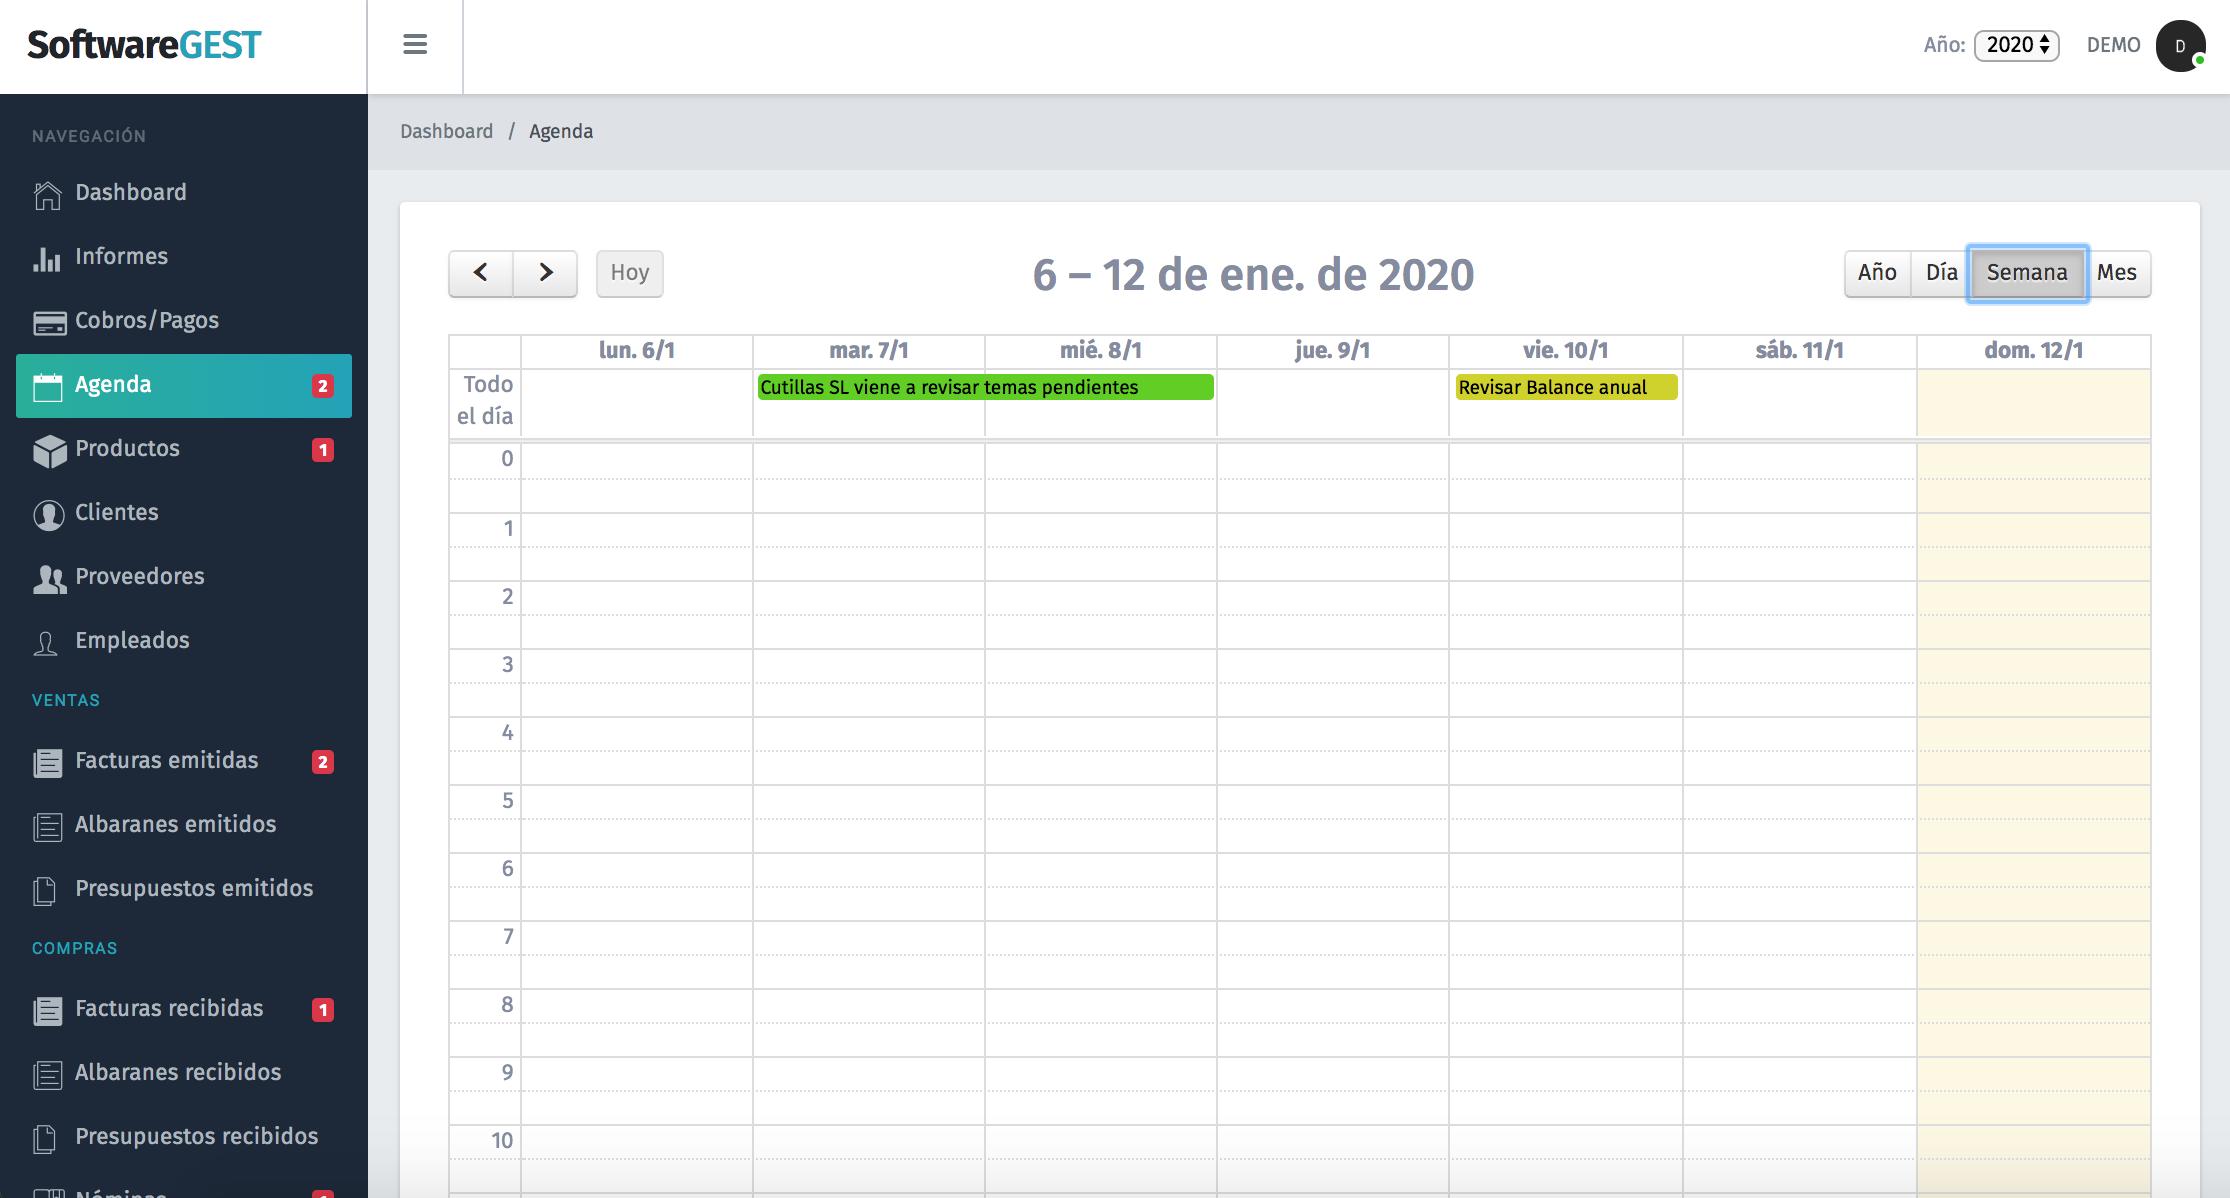 SoftwareGEST editar Agenda